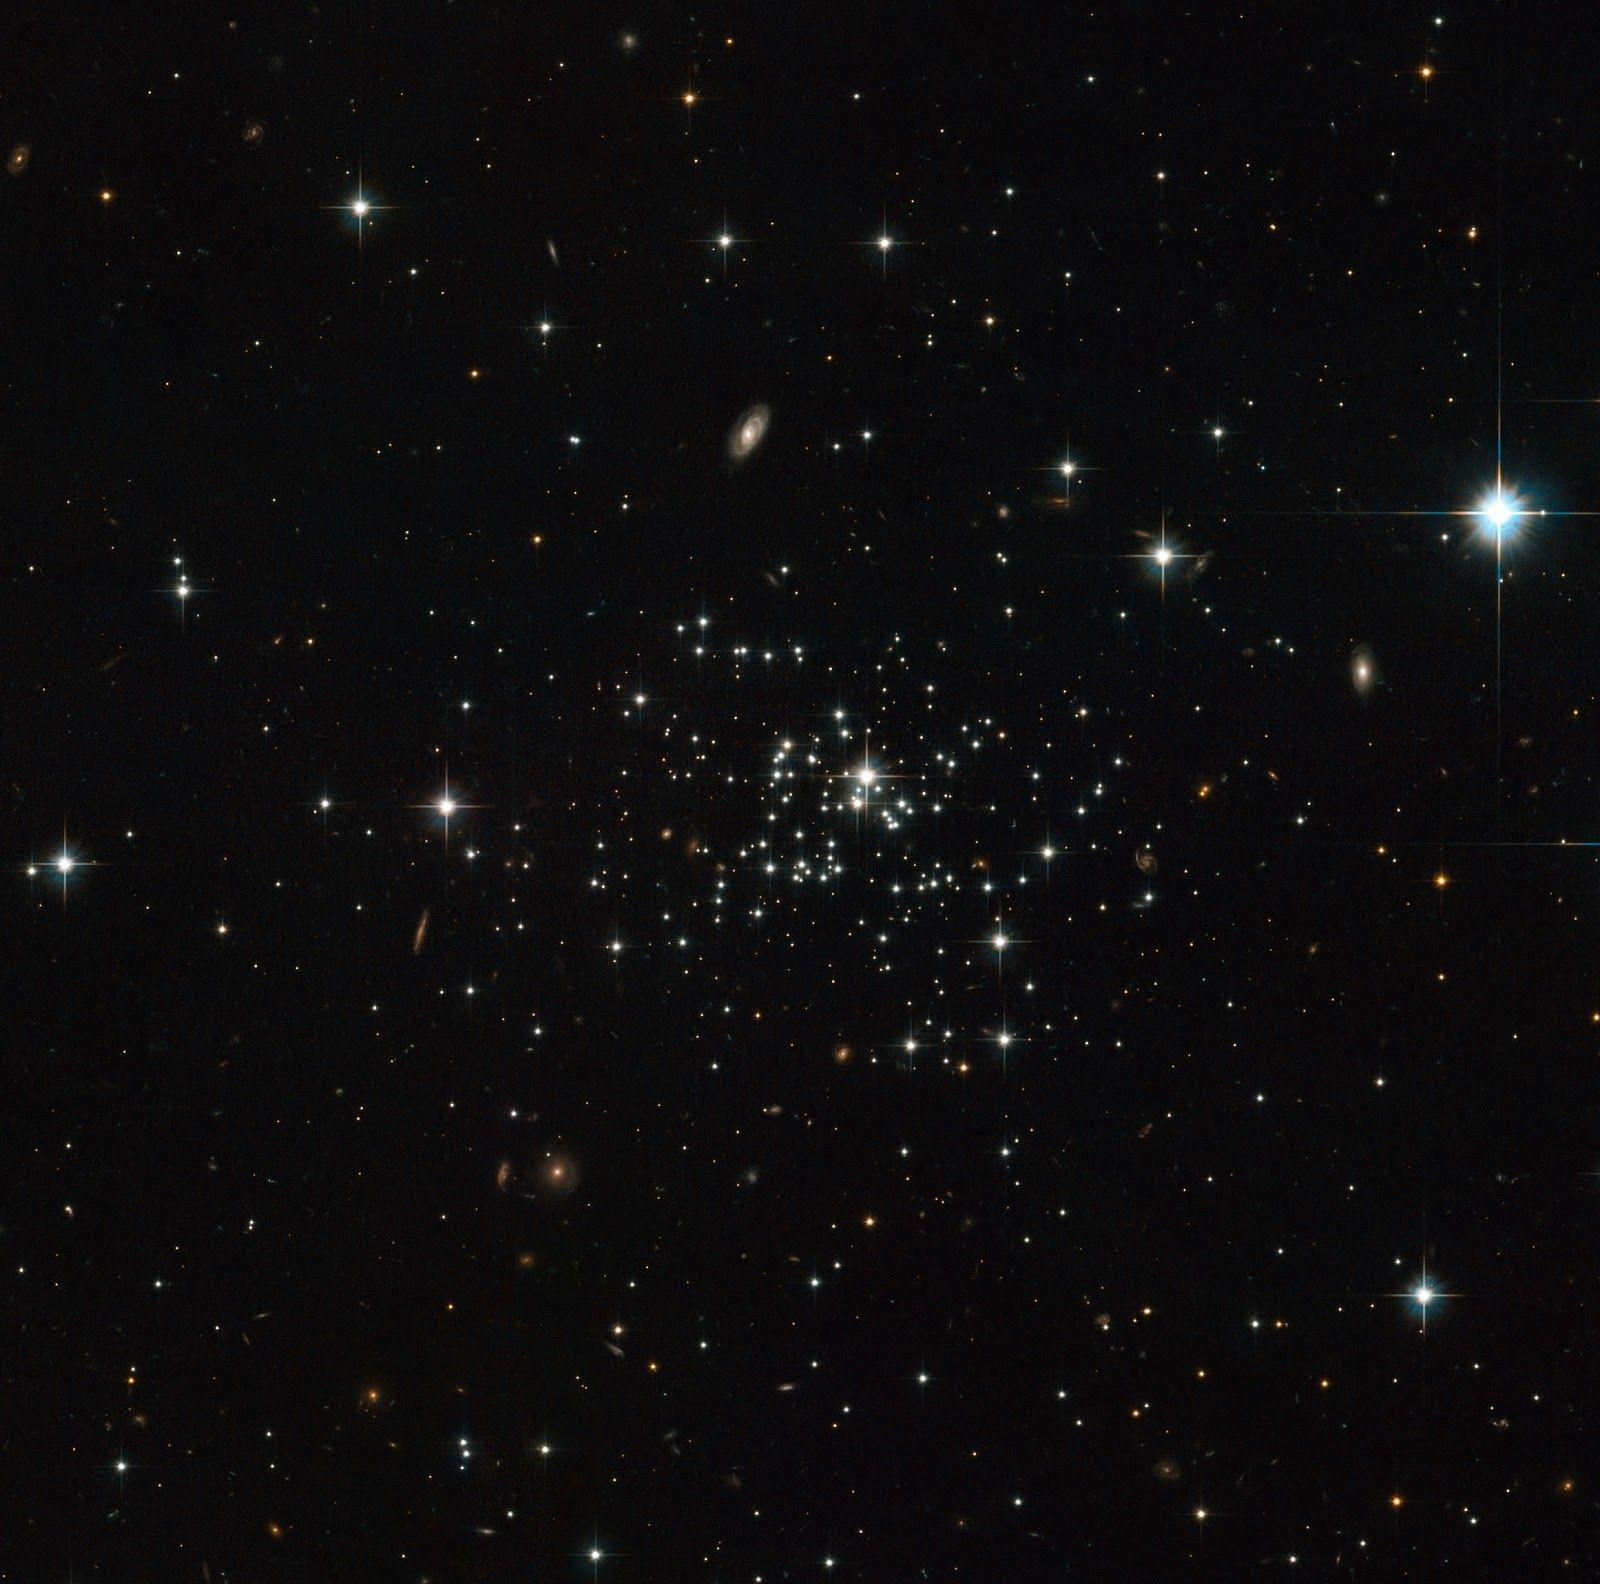 NGC 1466: Brilliant Globular Cluster Shines in New Hubble